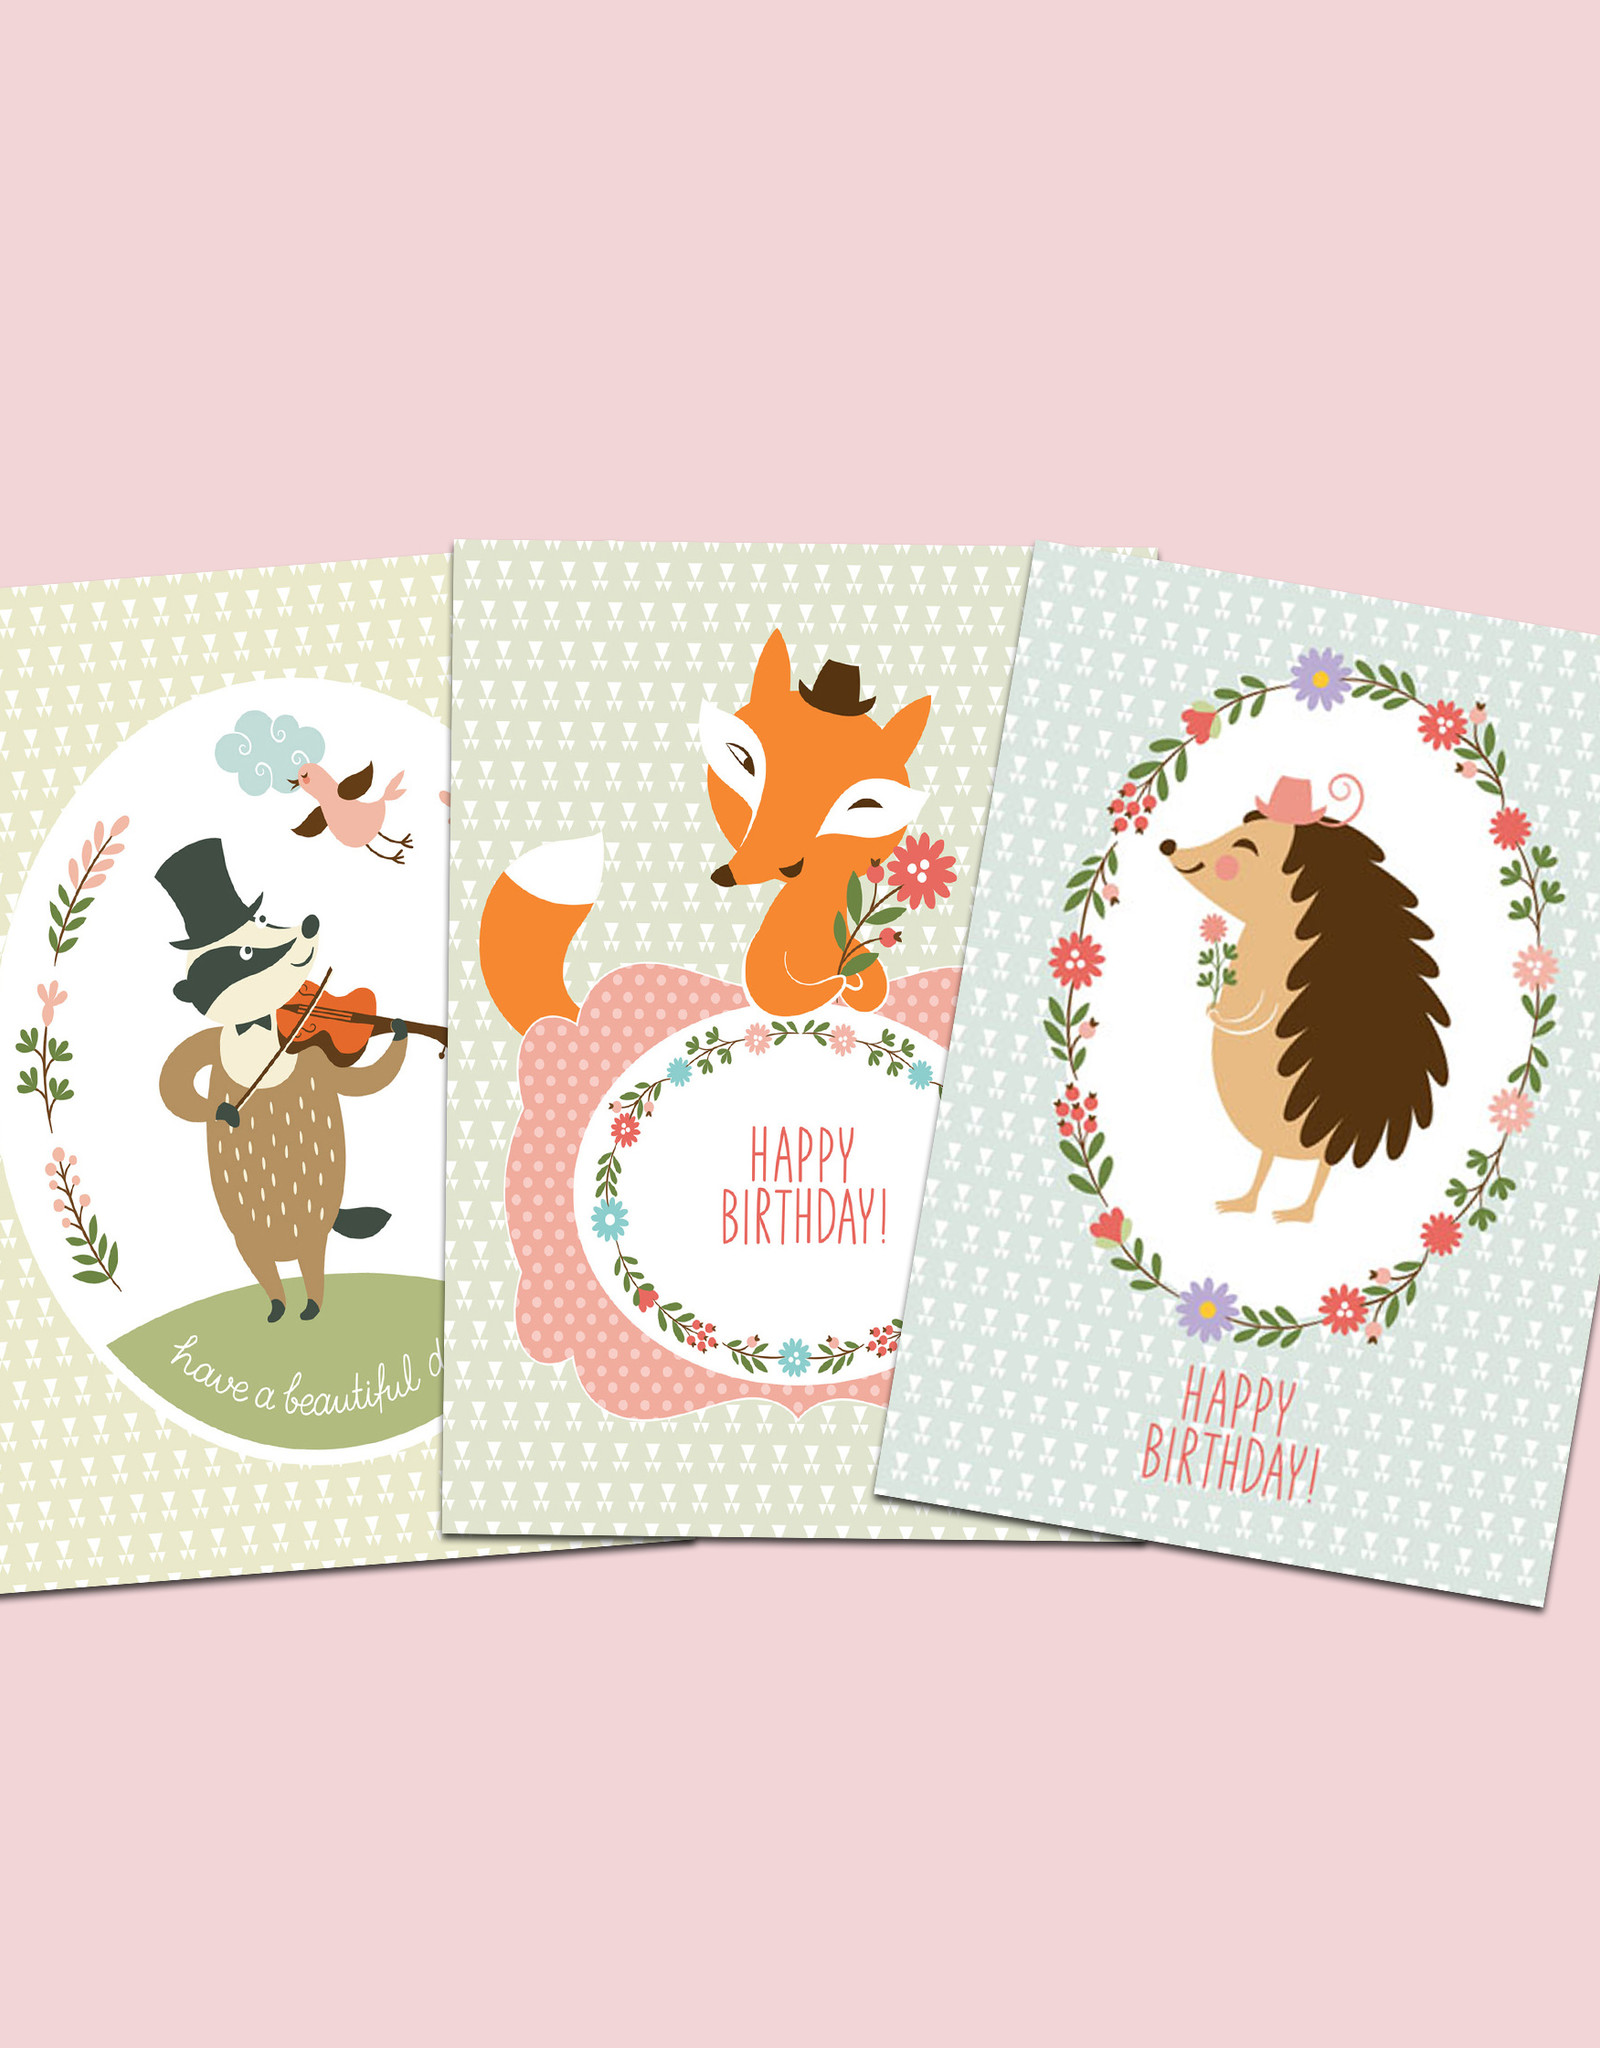 "Geburtstagskarten 3er Set Fuchs, Dachs, Igel"" Postkarten-Set"